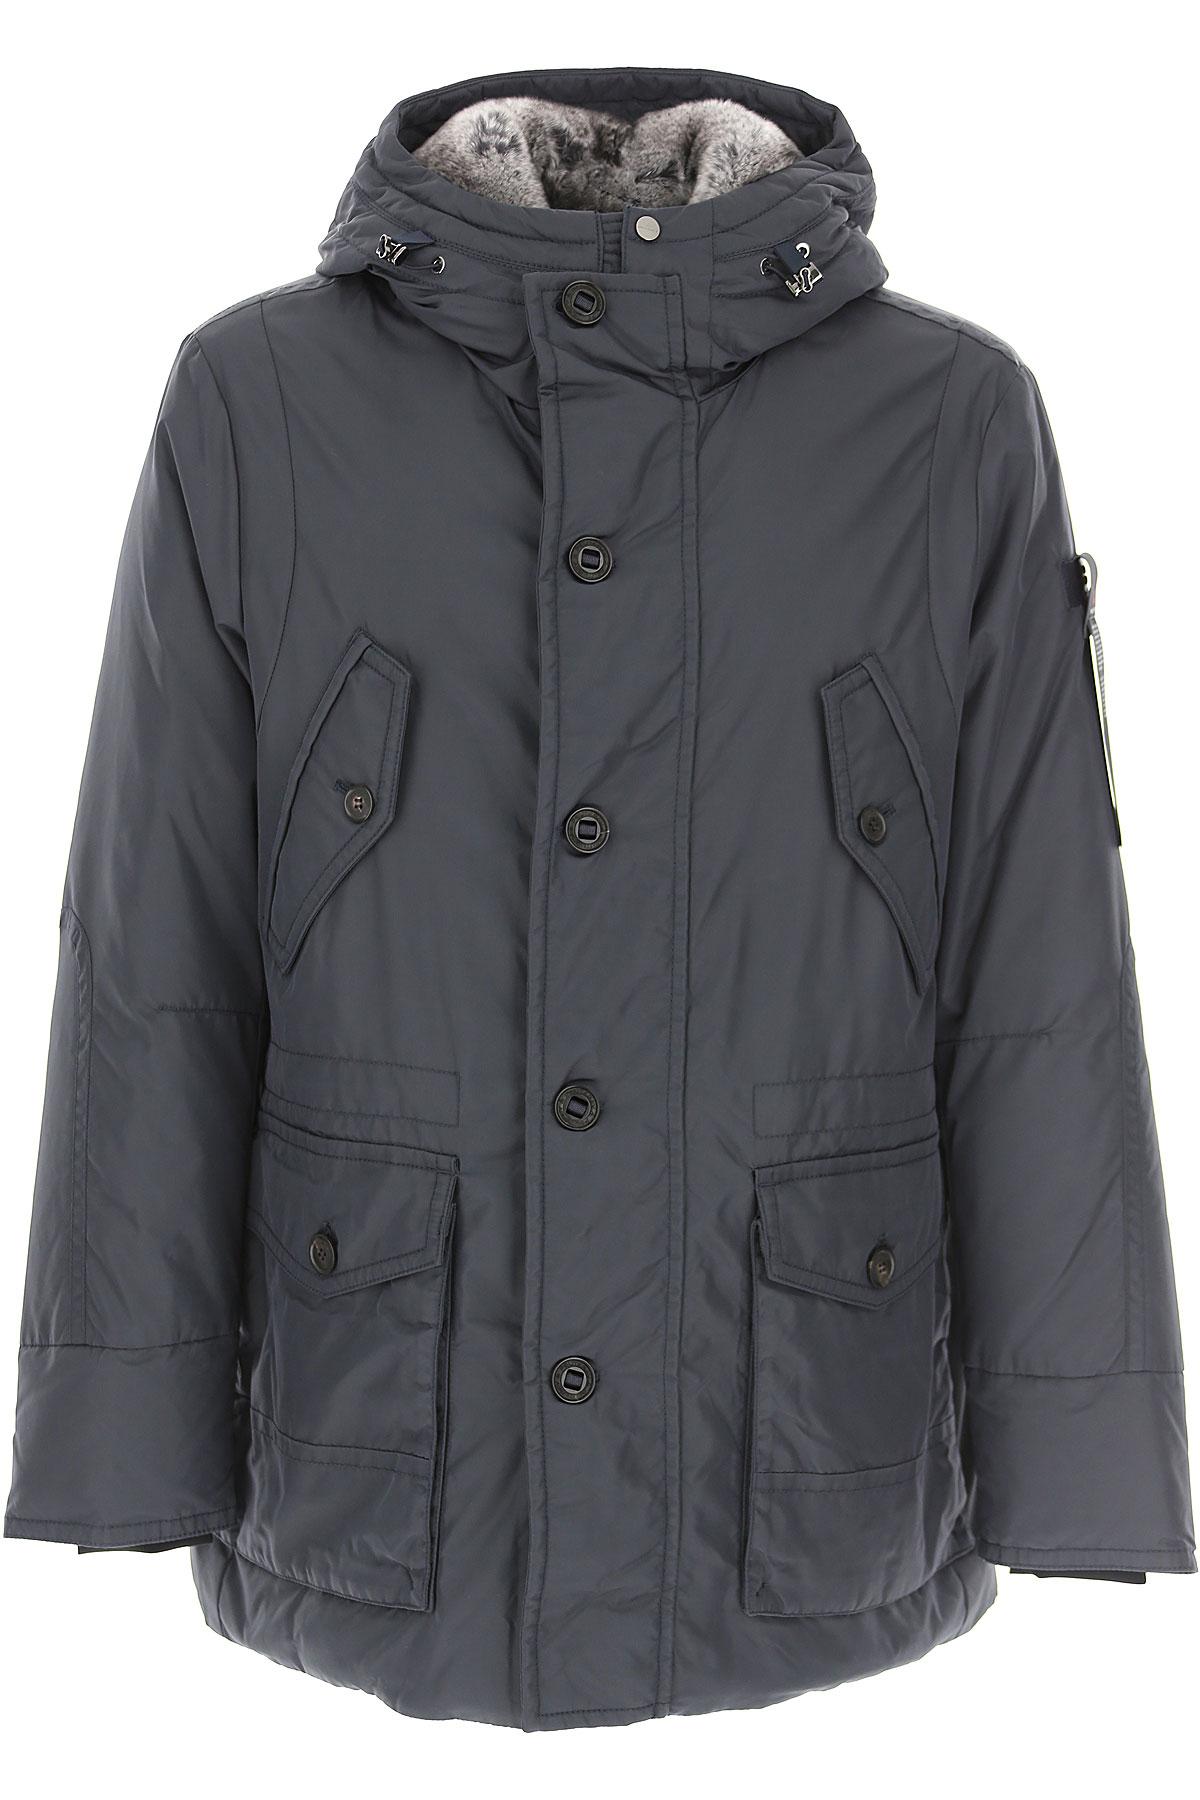 Peuterey Down Jacket for Men, Puffer Ski Jacket On Sale, Navy Blue, Down, 2019, L M XL XXL